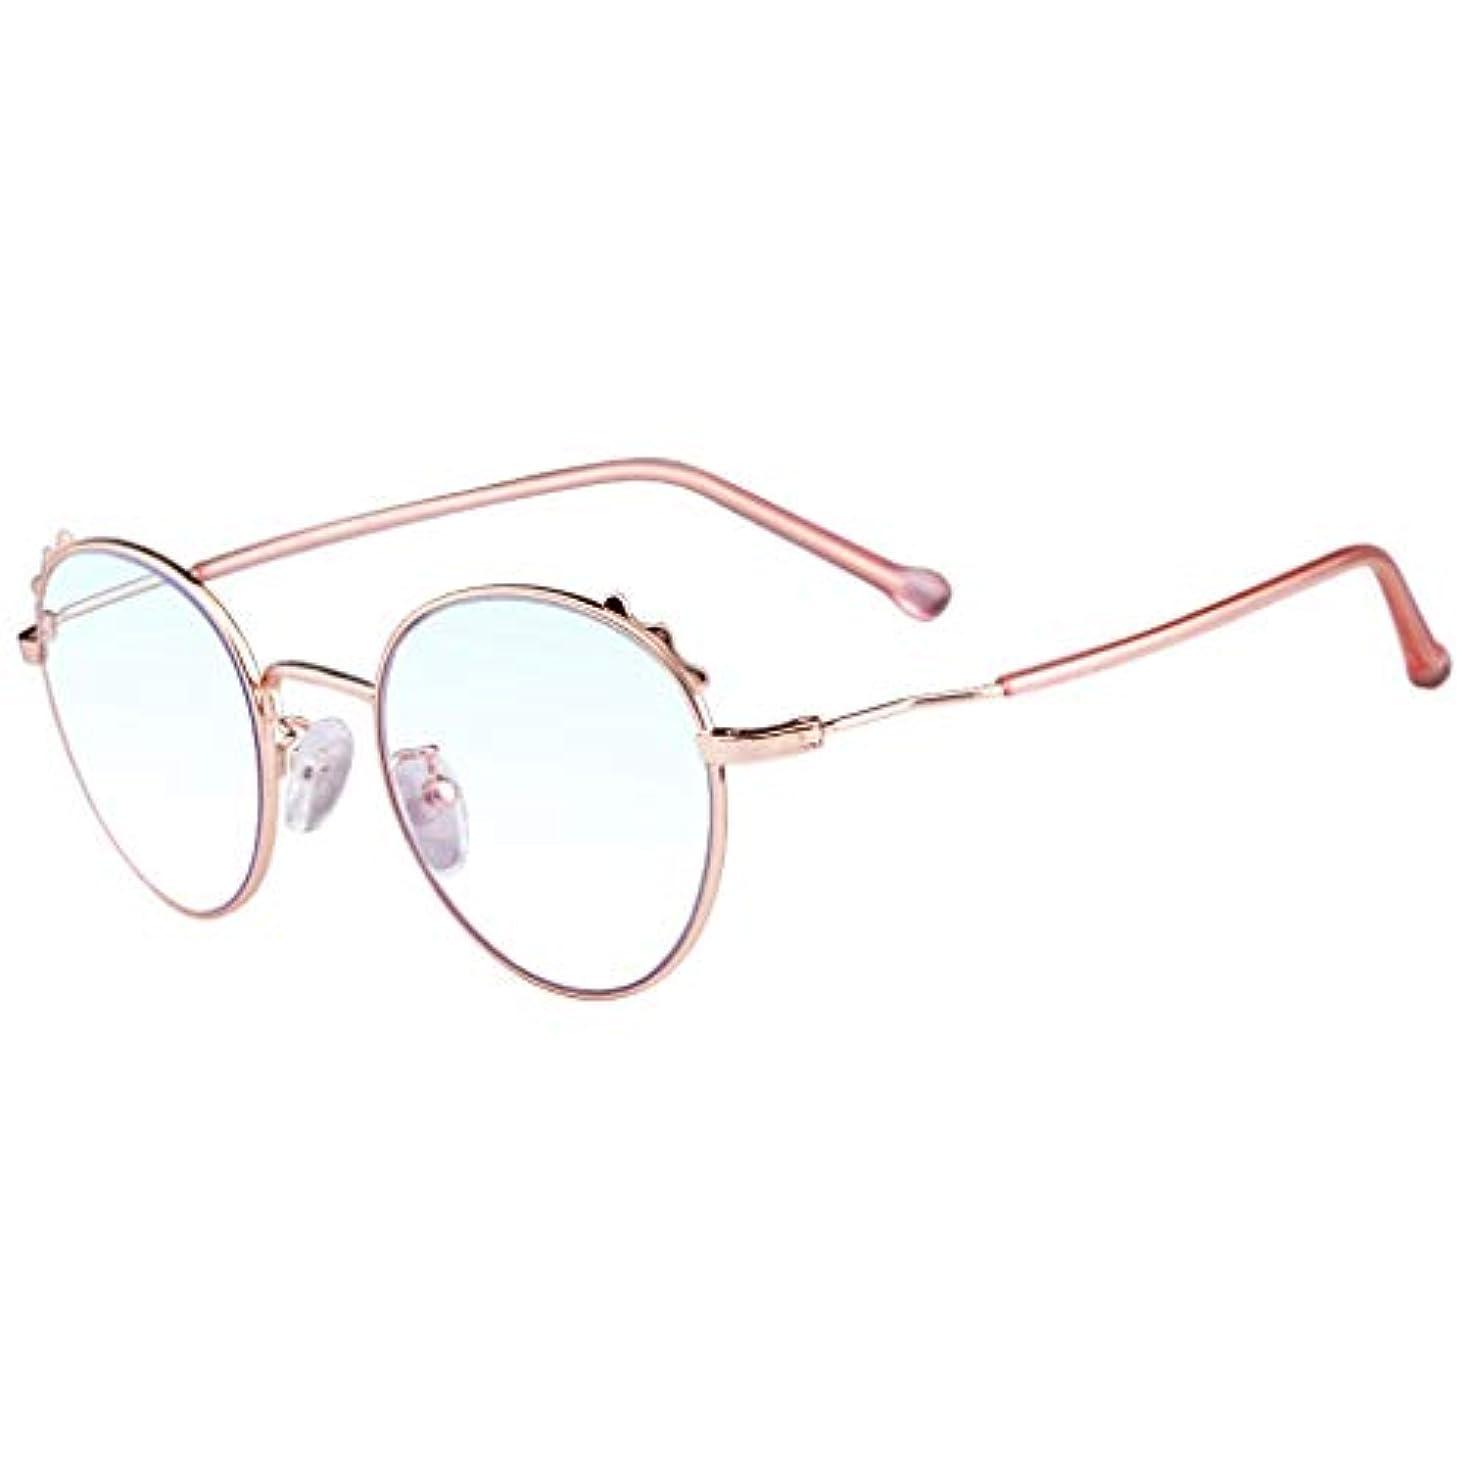 LCSHAN ラウンドフレーム老眼鏡レトロ遠近両用アンチブルーライトインテリジェントオートズームHDラージフレーム (Color : Pink, Size : 350 degrees)